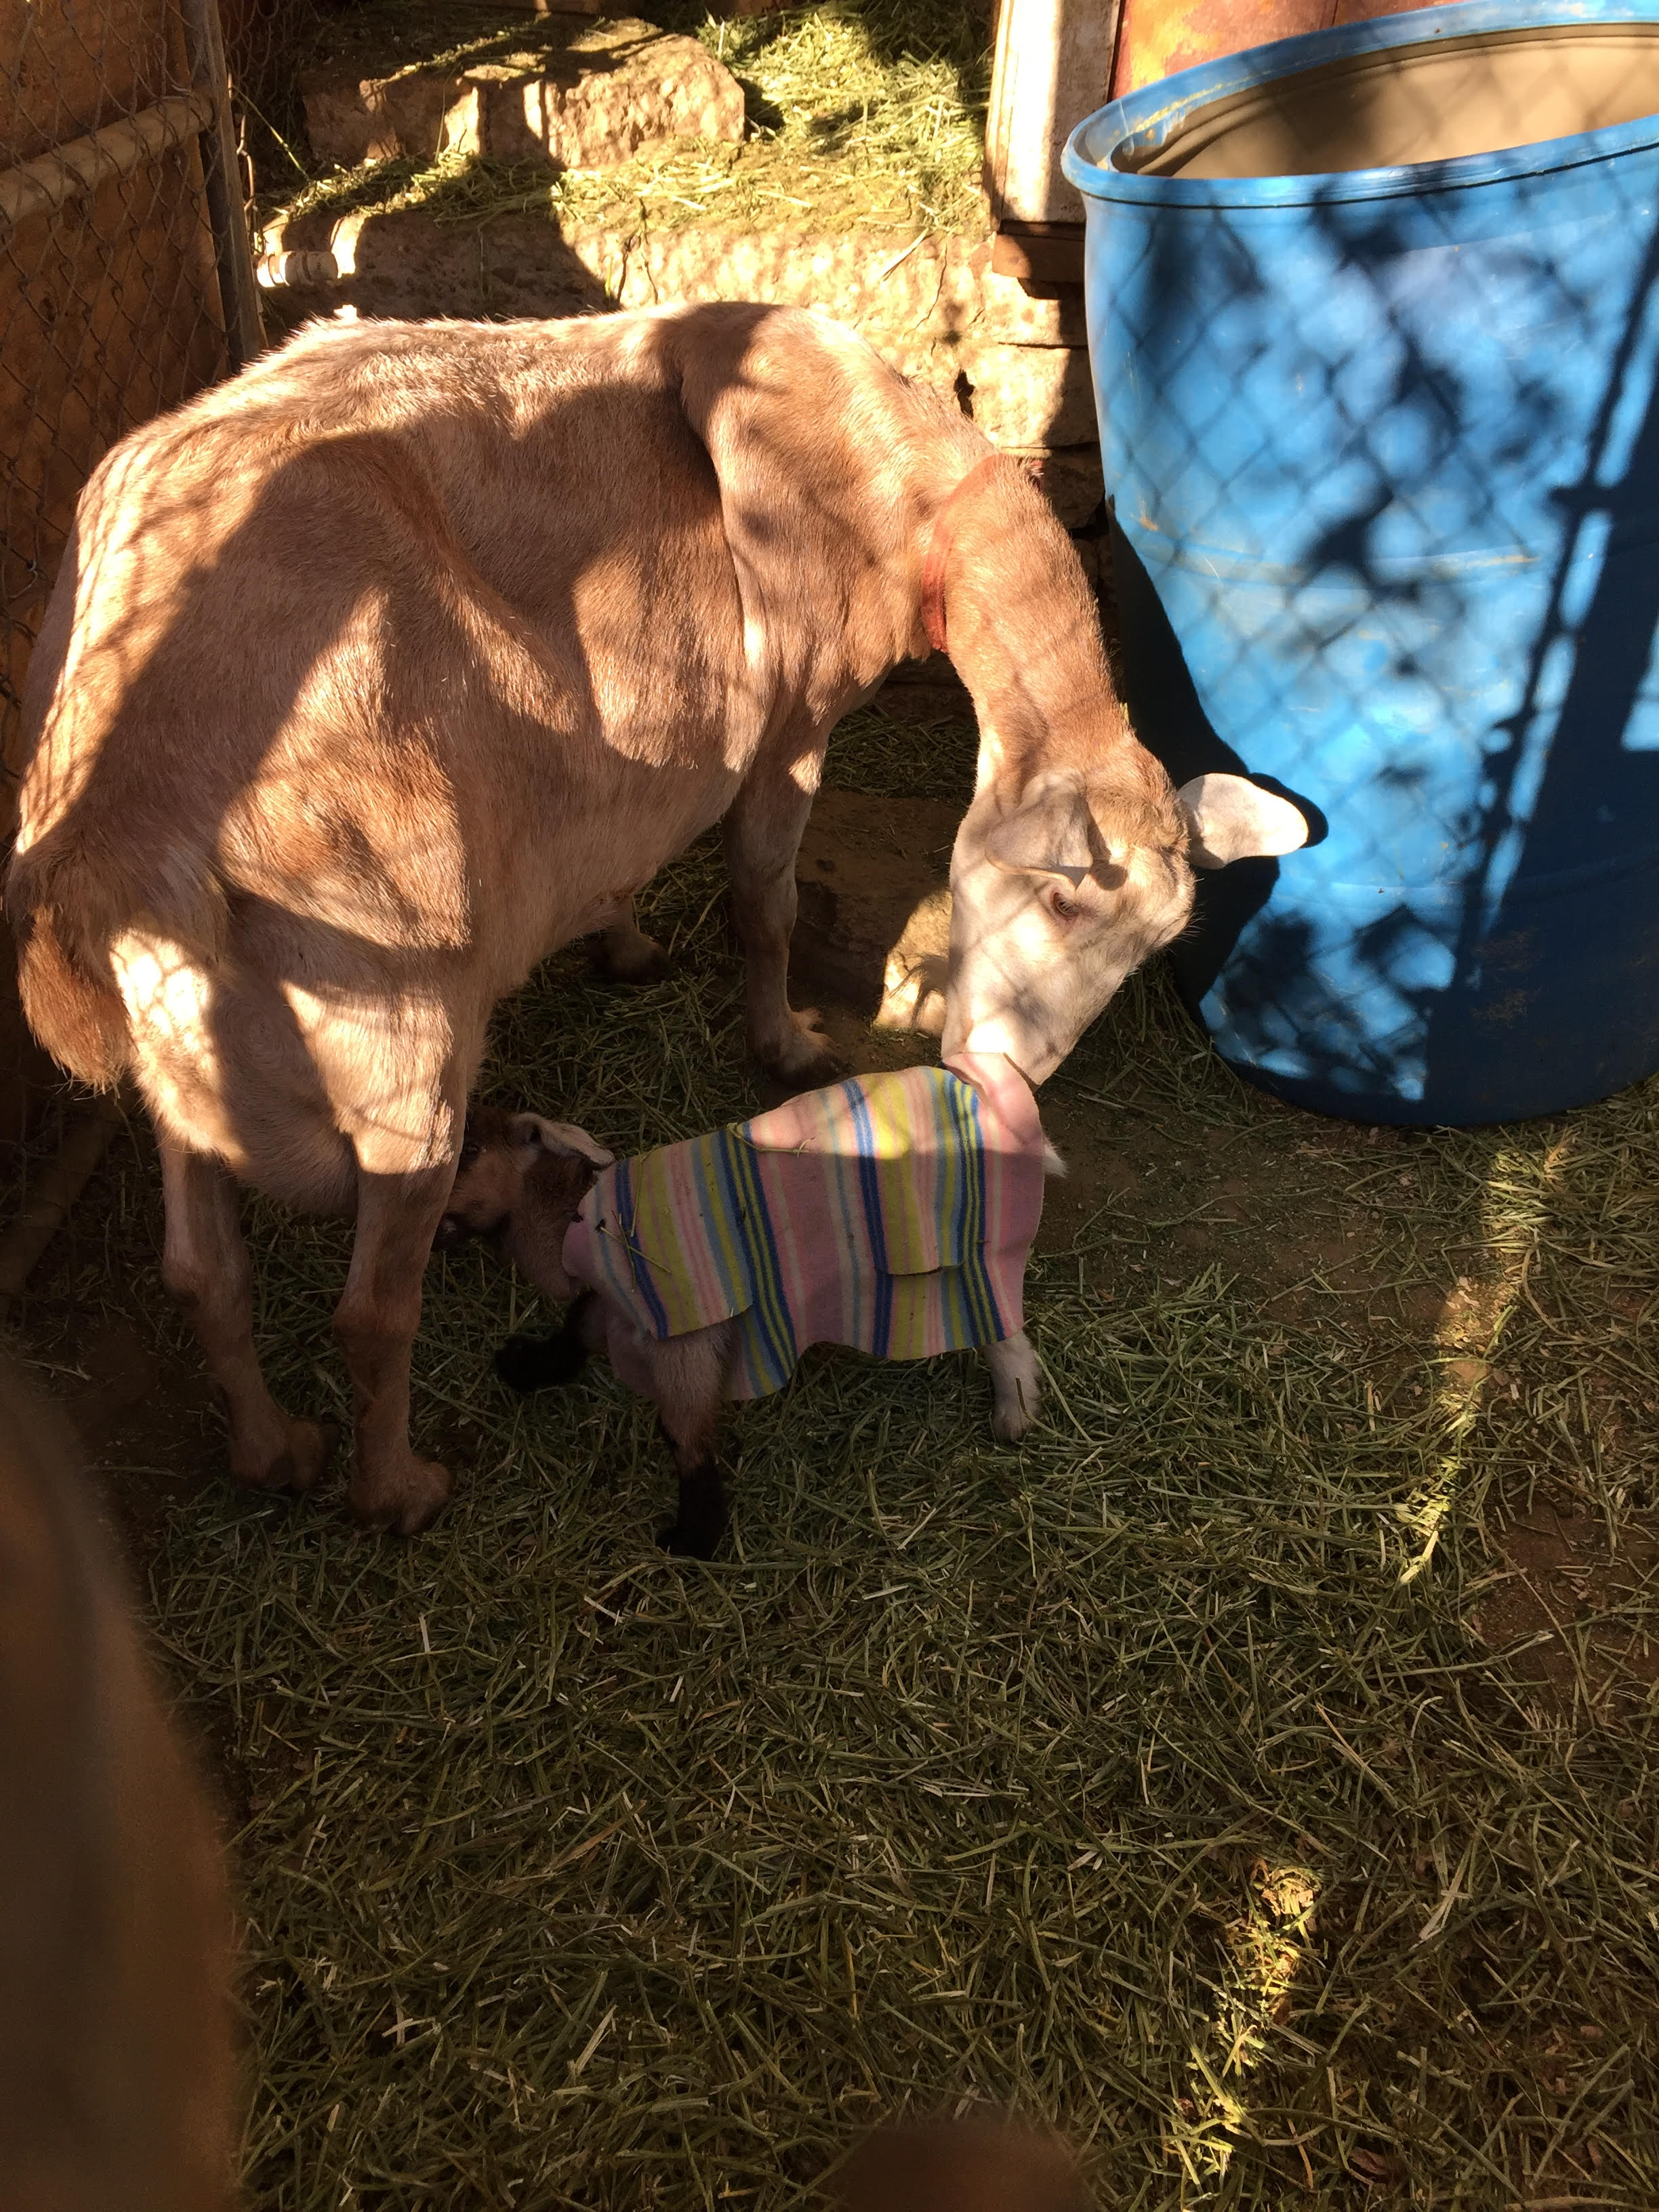 Goat kid in blanket Feb 2016